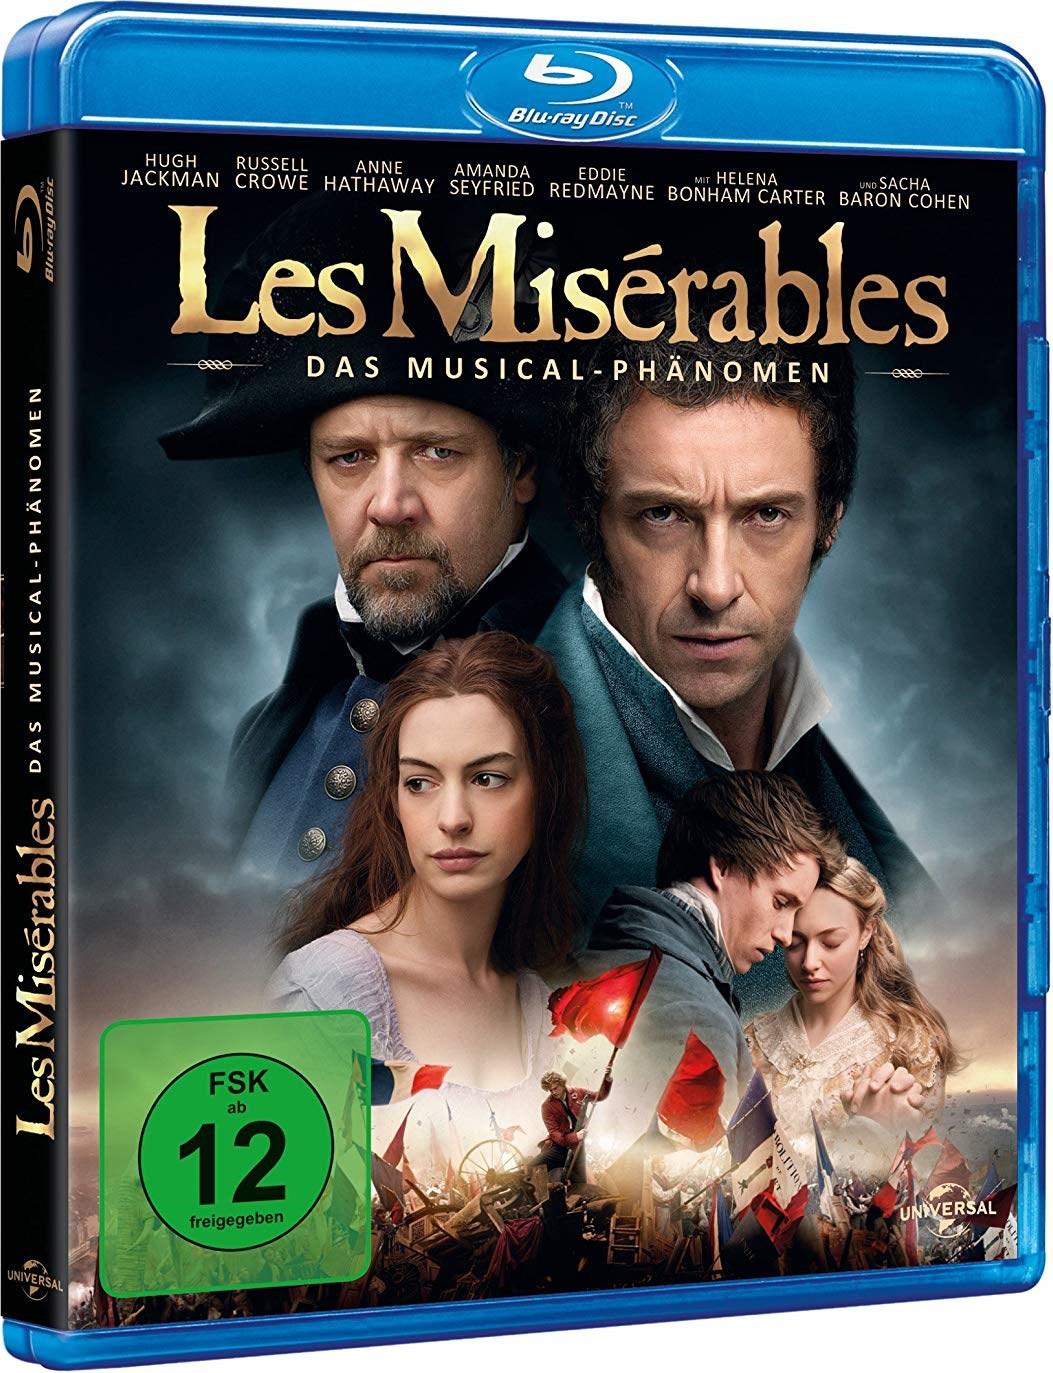 [ebay - dodax | mecodu] Les Misérables (Blu-ray) für 3,68€ inkl. Versand